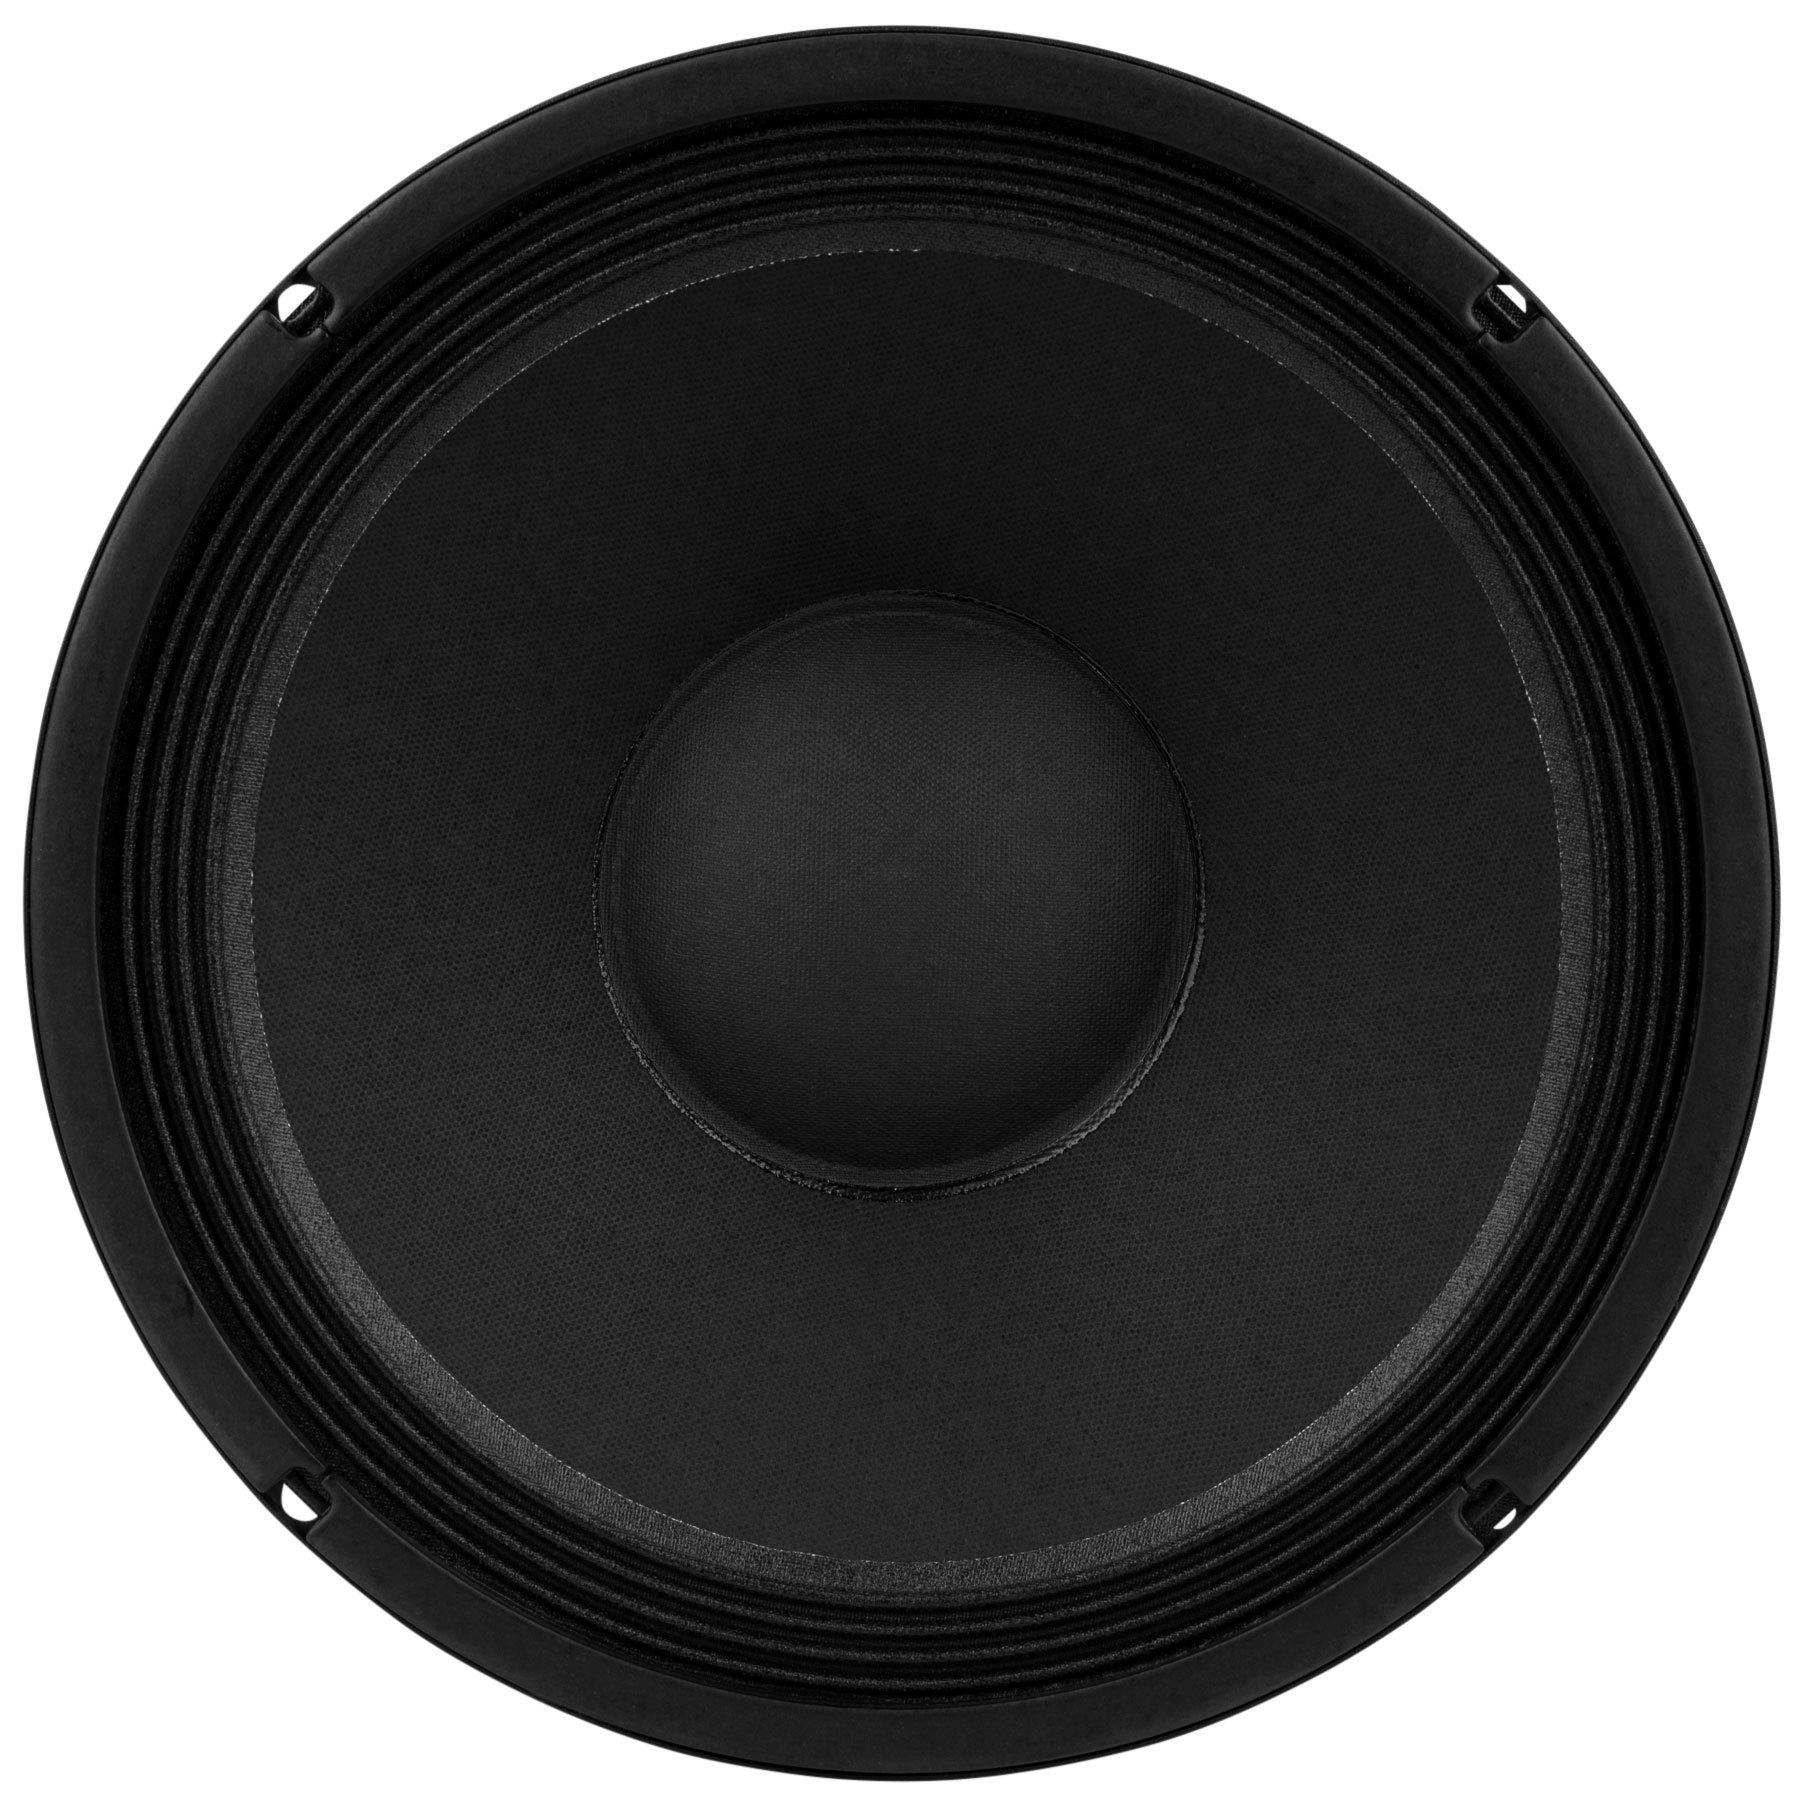 Celestion Pulse Series 12 Inch 200 Watt 8 ohm Ceramic Bass Replacement Speaker 12 in. 8 Ohm